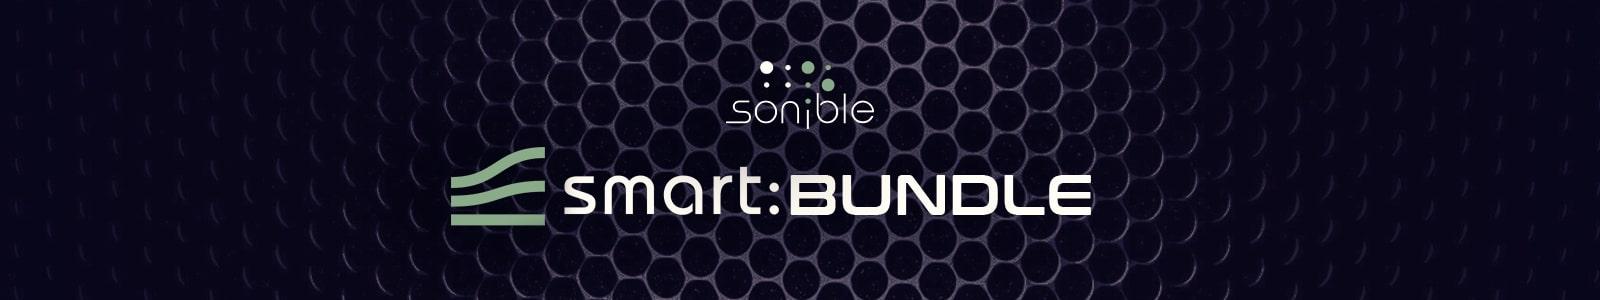 smart:Bundle by sonible